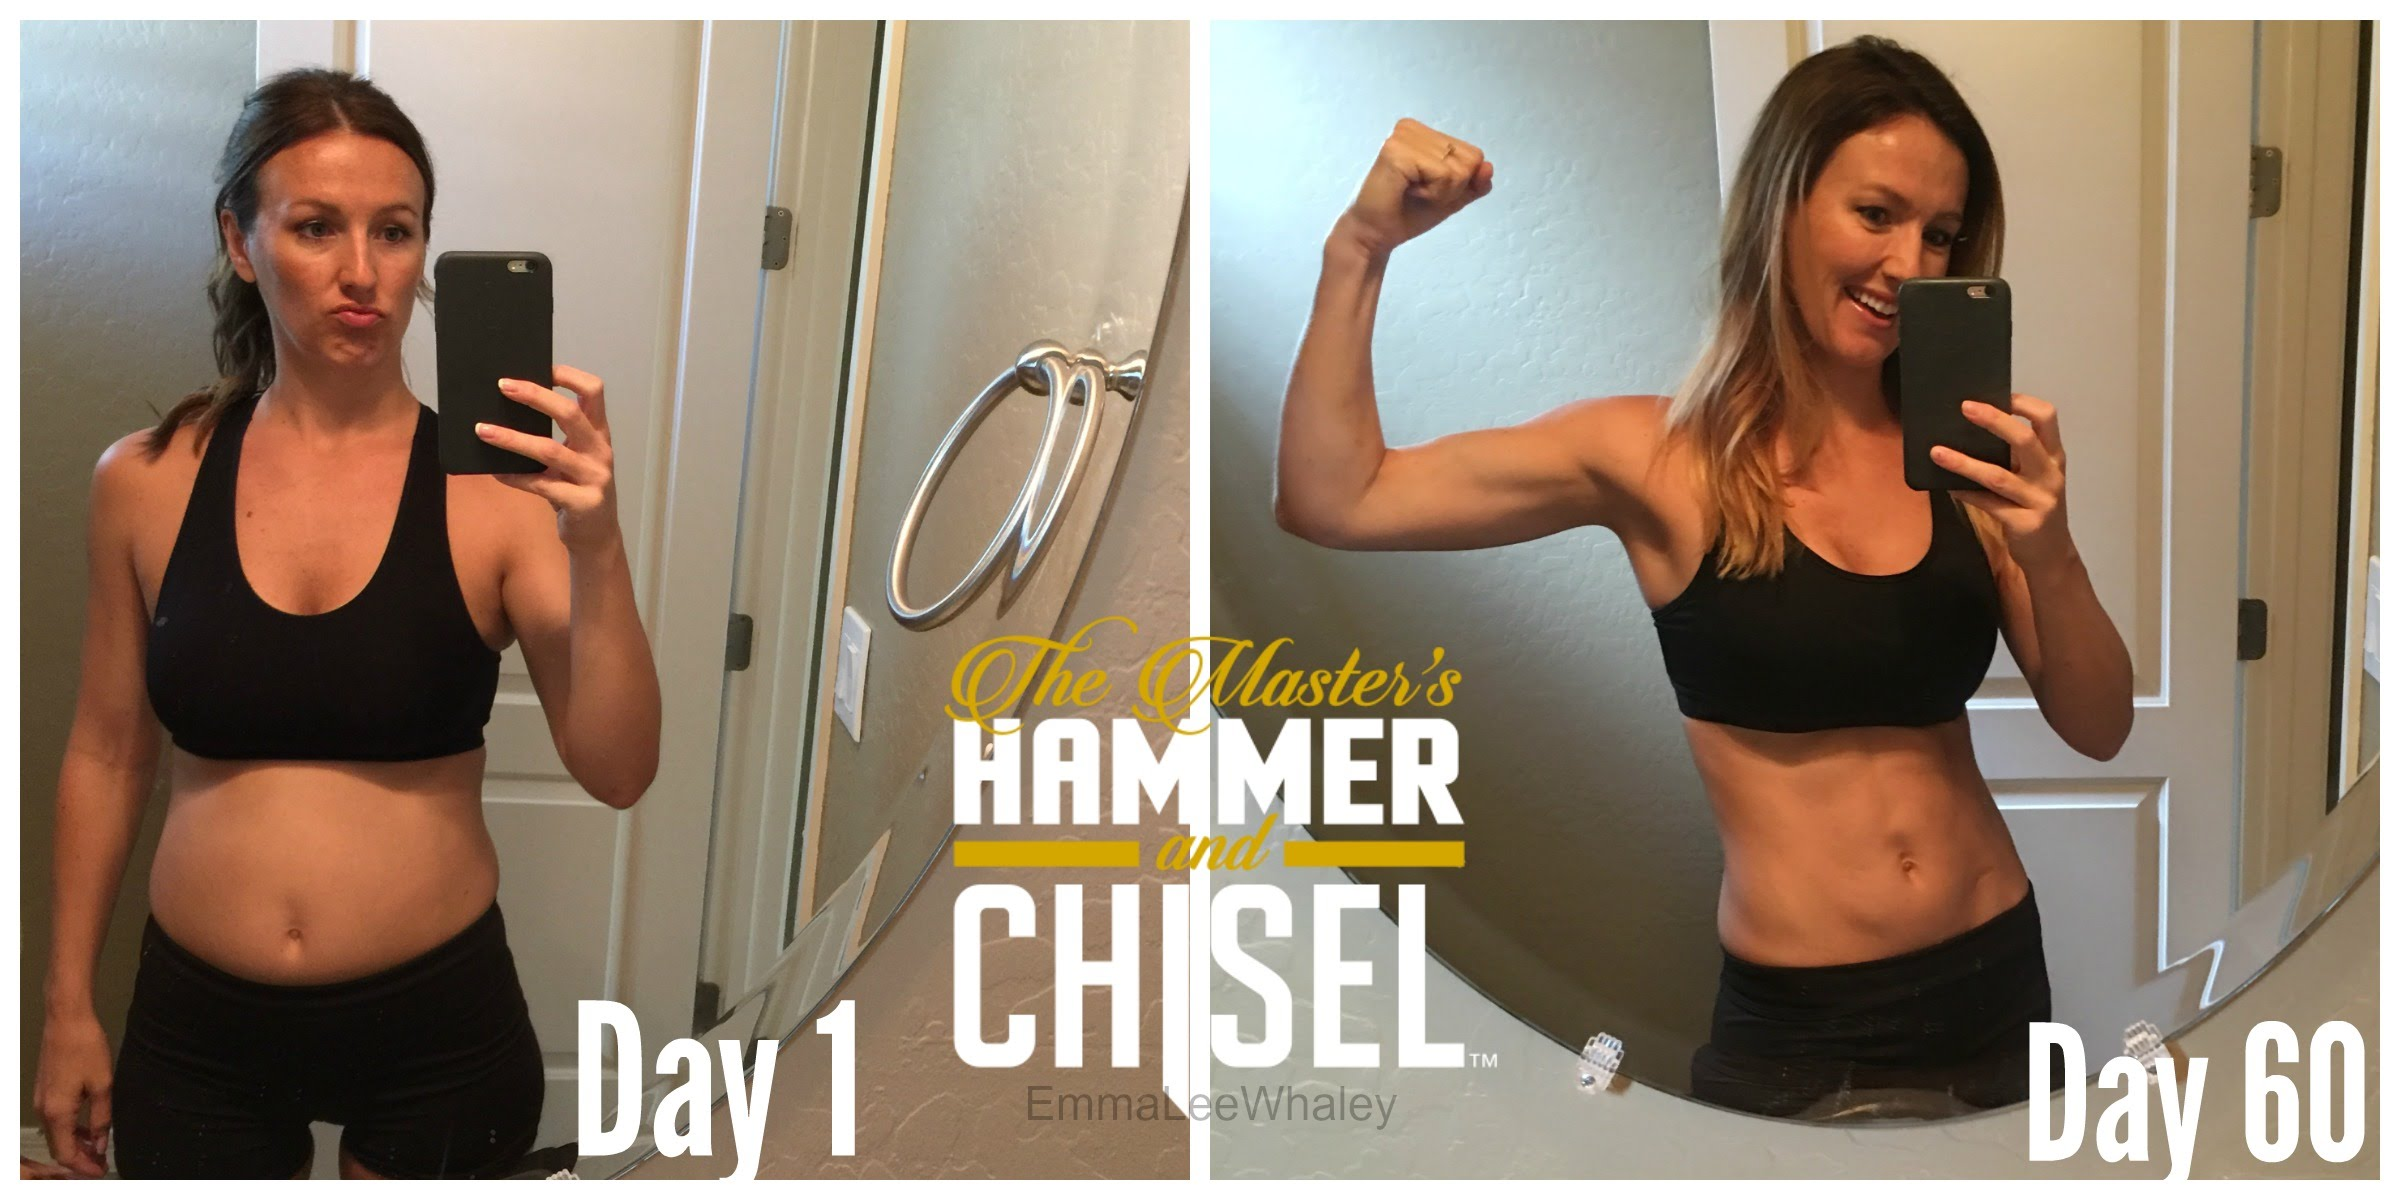 Hammer & Chisel Results